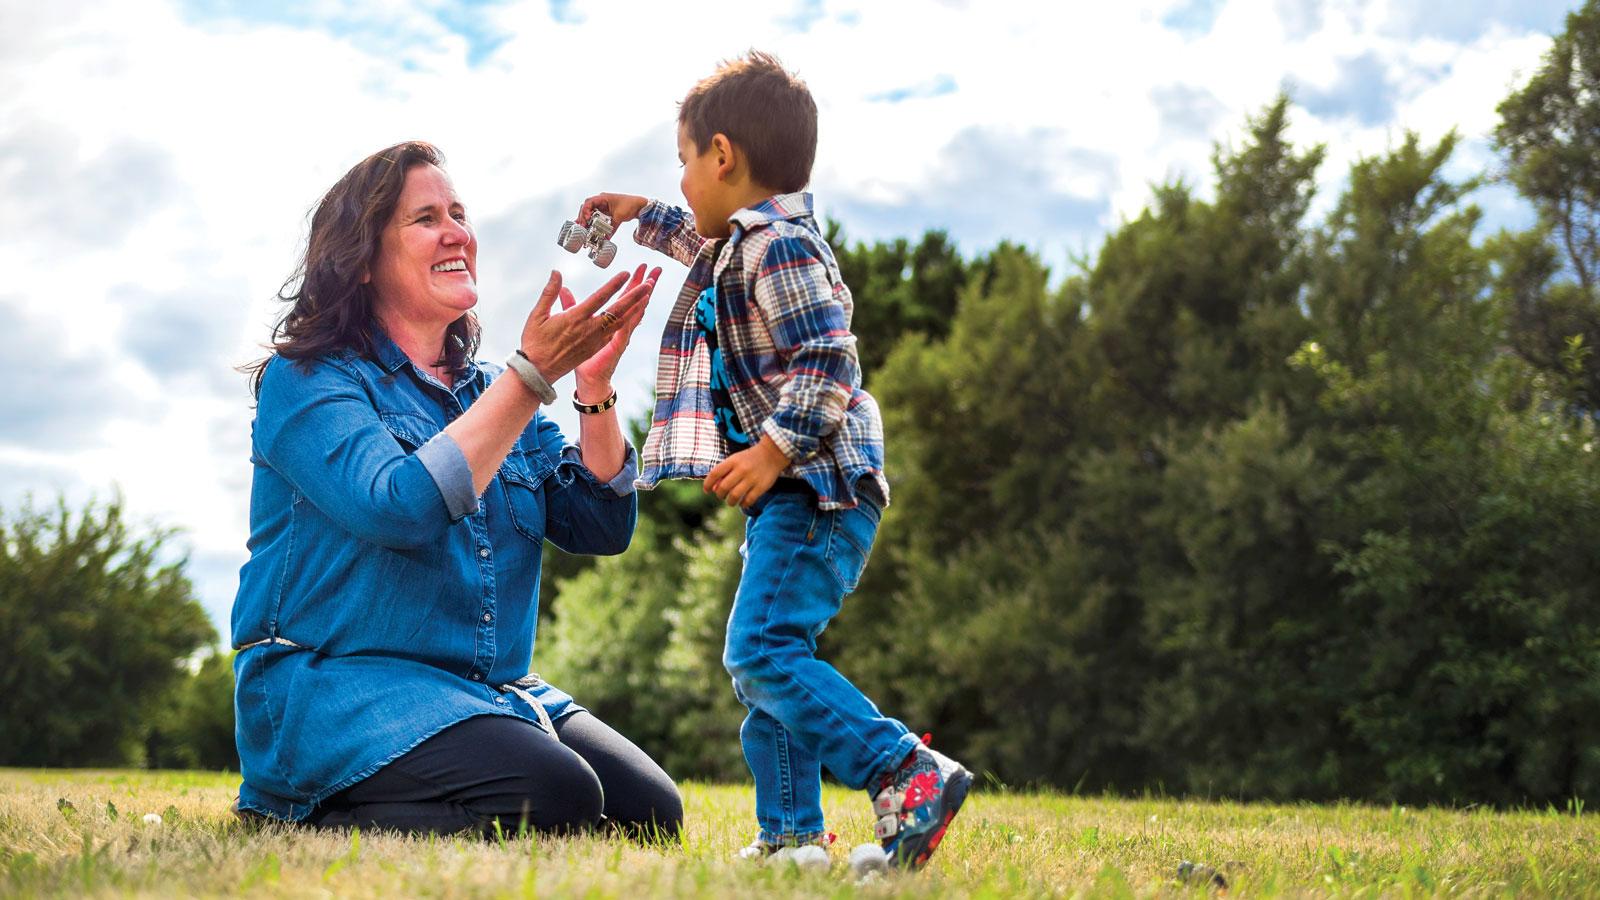 Norma Dunning, '12 BA(NativeStu), '12 Cert(AborGov/Ptnshp), '14 MA with her three-year-old grandson